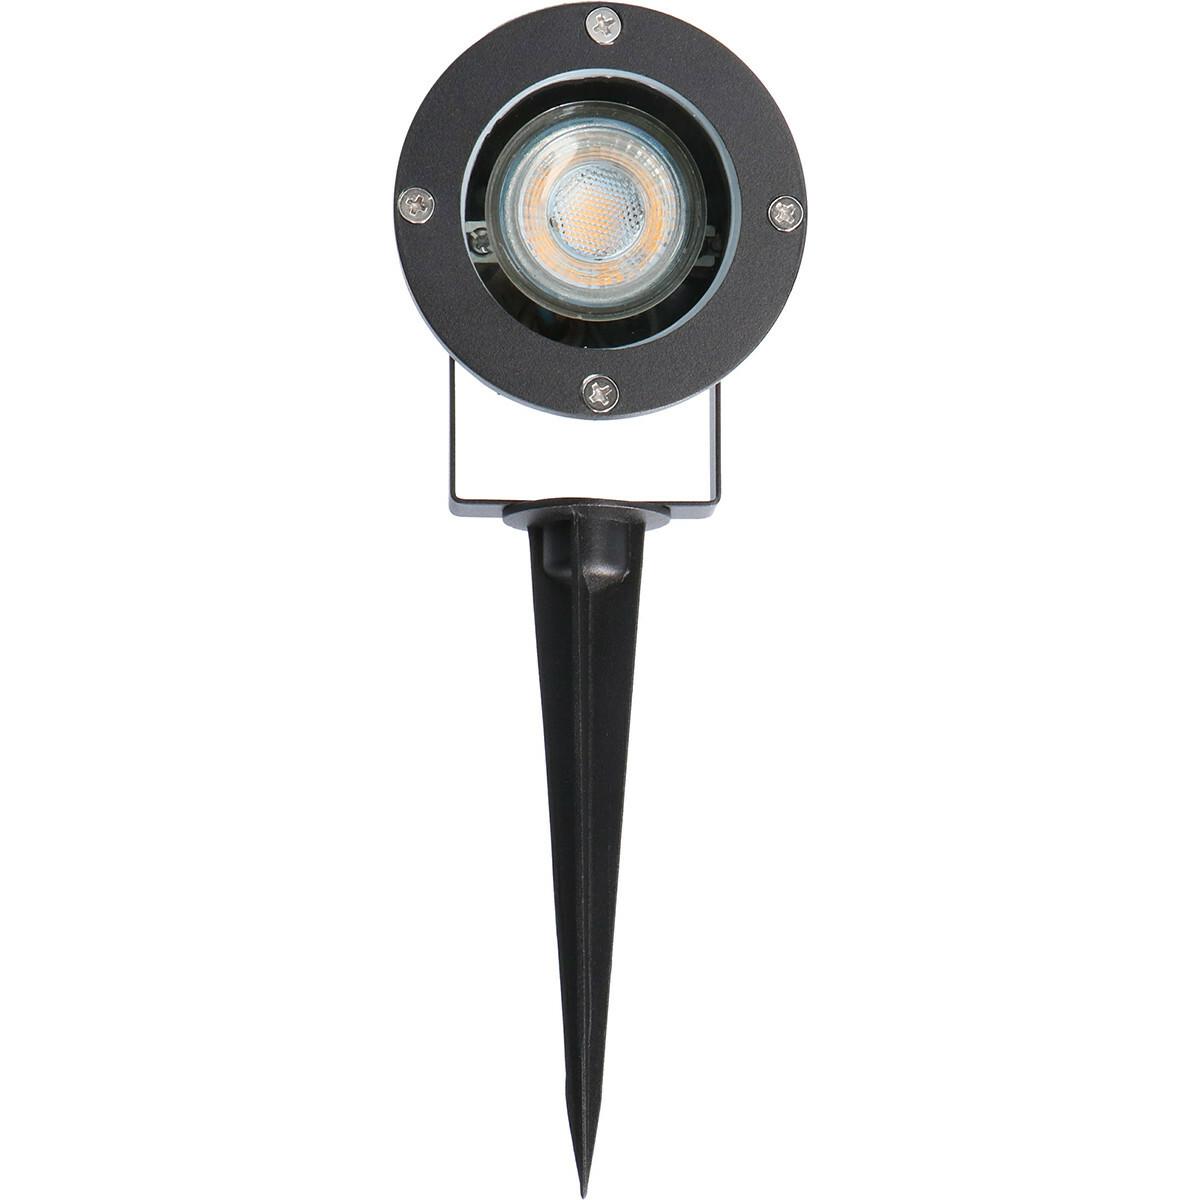 PHILIPS - Prikspot met Stekker - CorePro 840 36D - Sanola Urbun - GU10 Fitting - 4.6W - Natuurlijk W